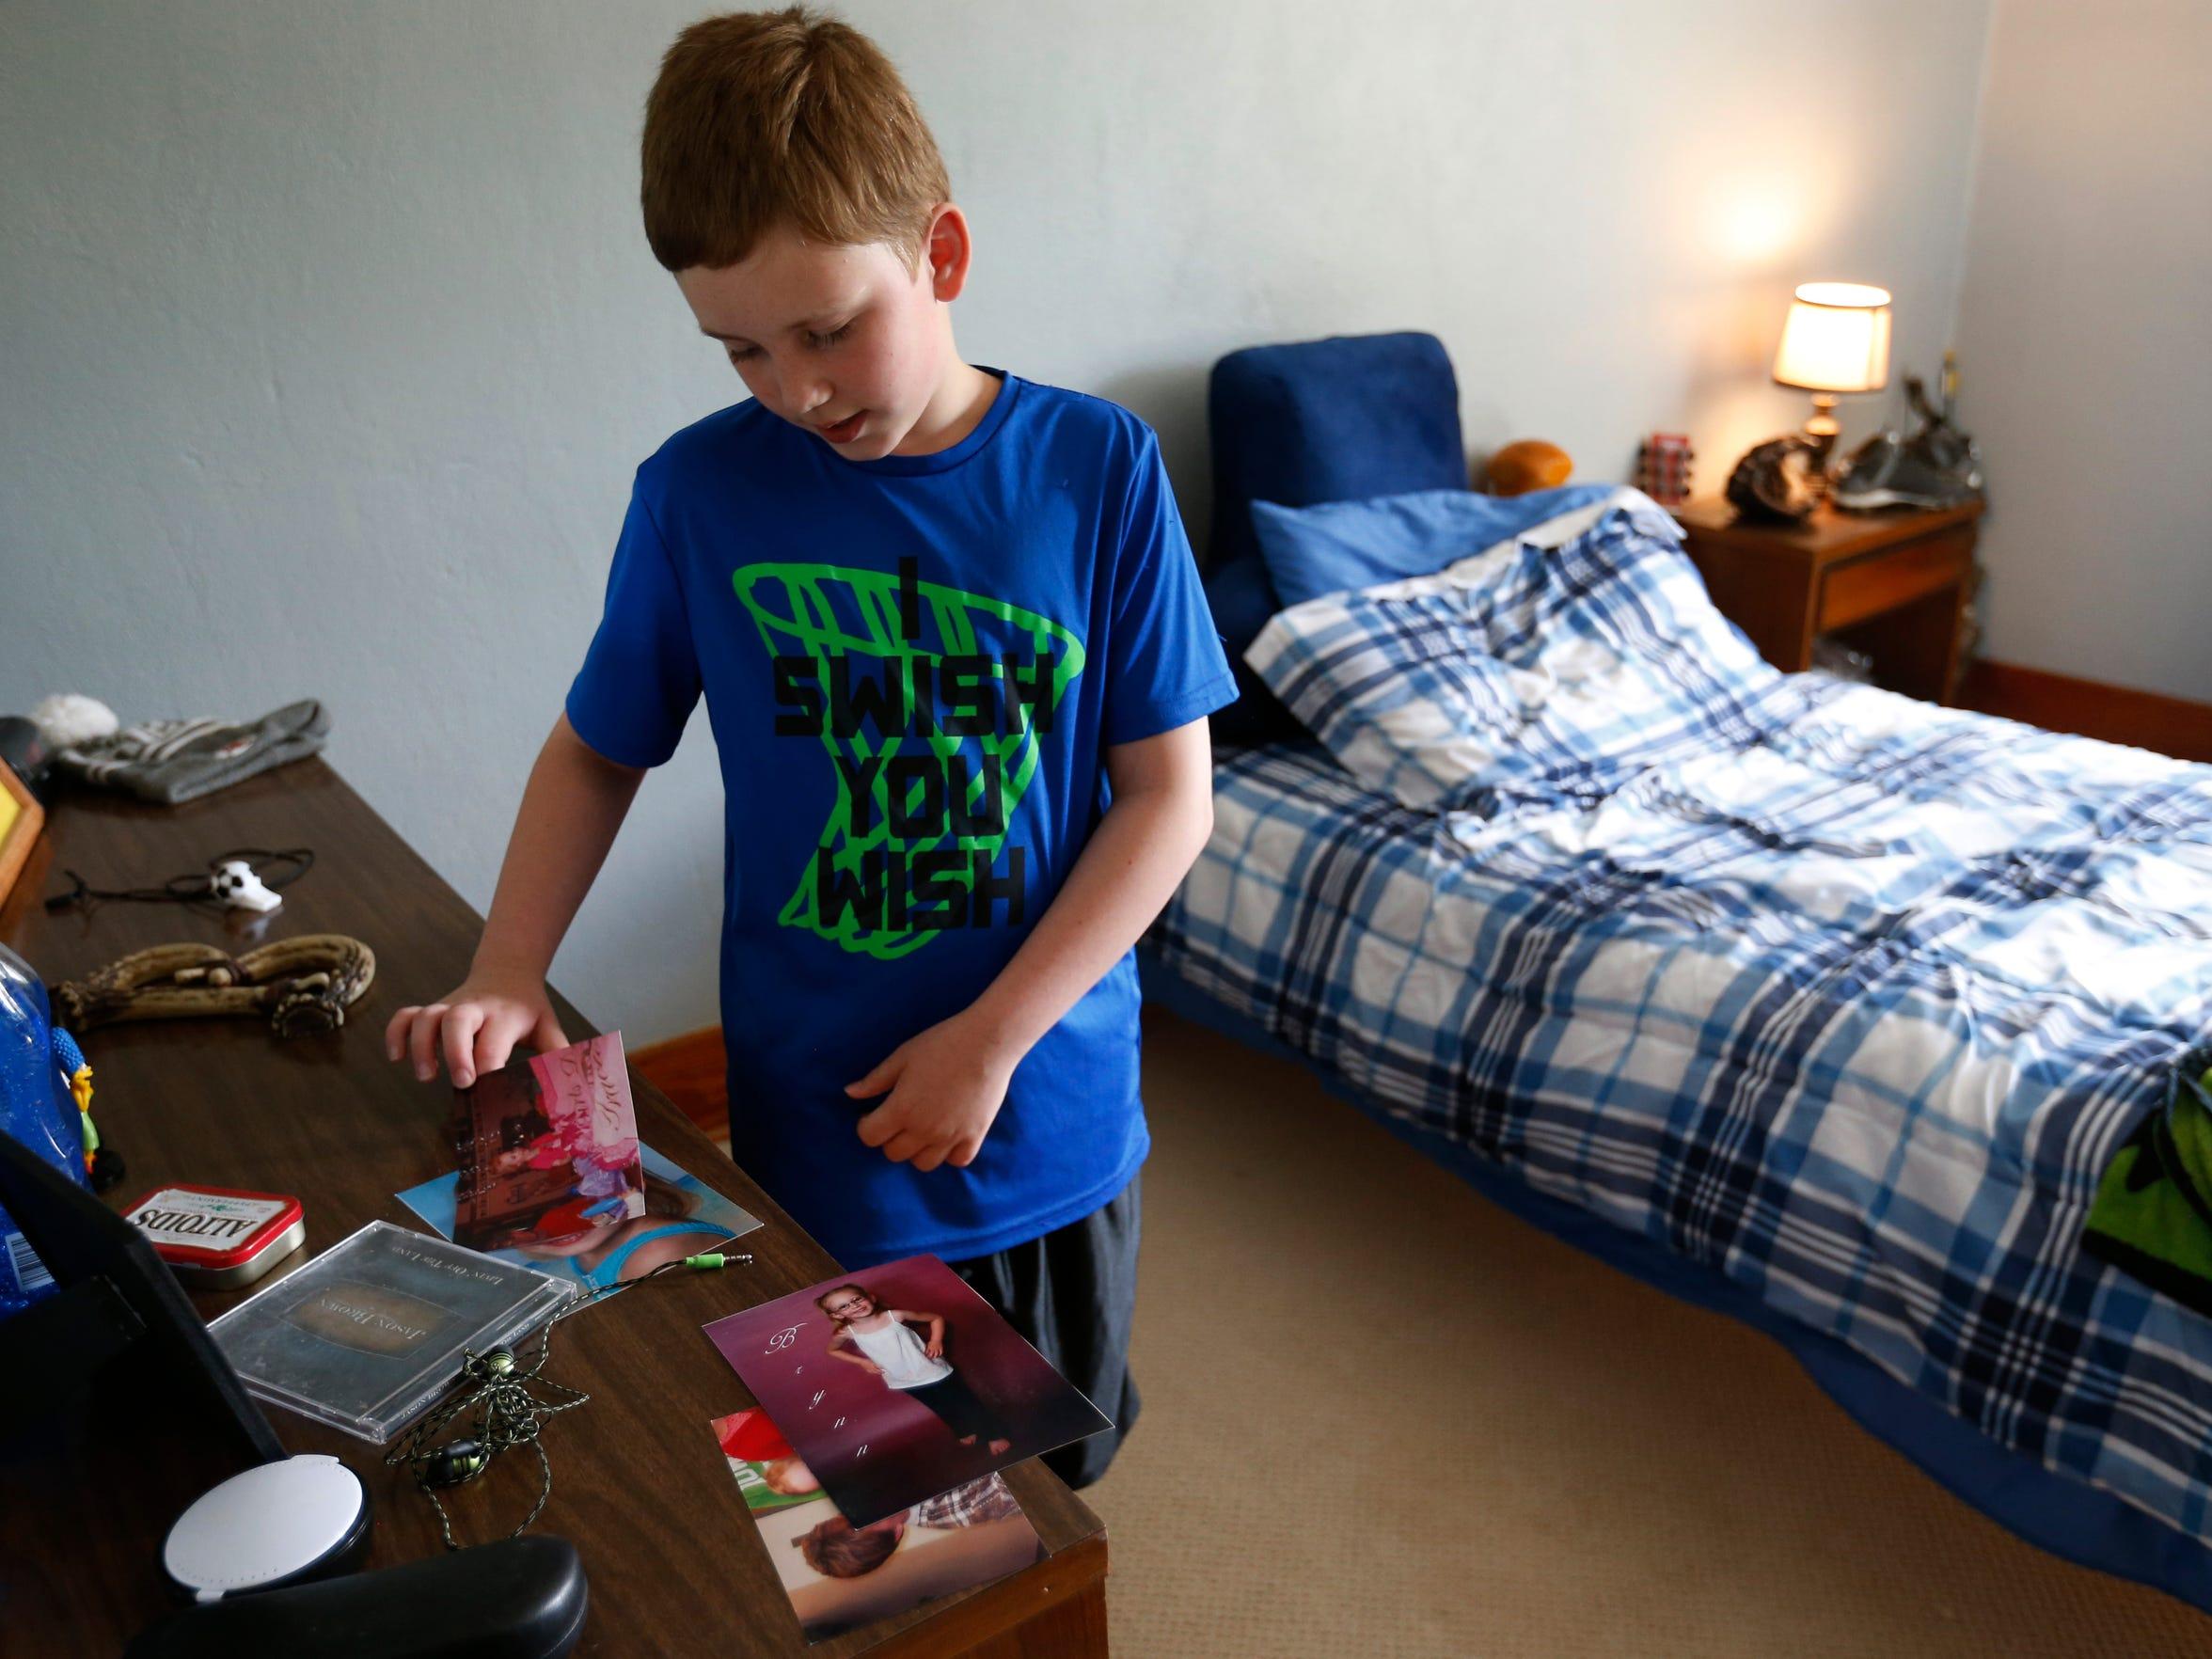 Bryan Brown, 10, looks at photos of him as Brynn at